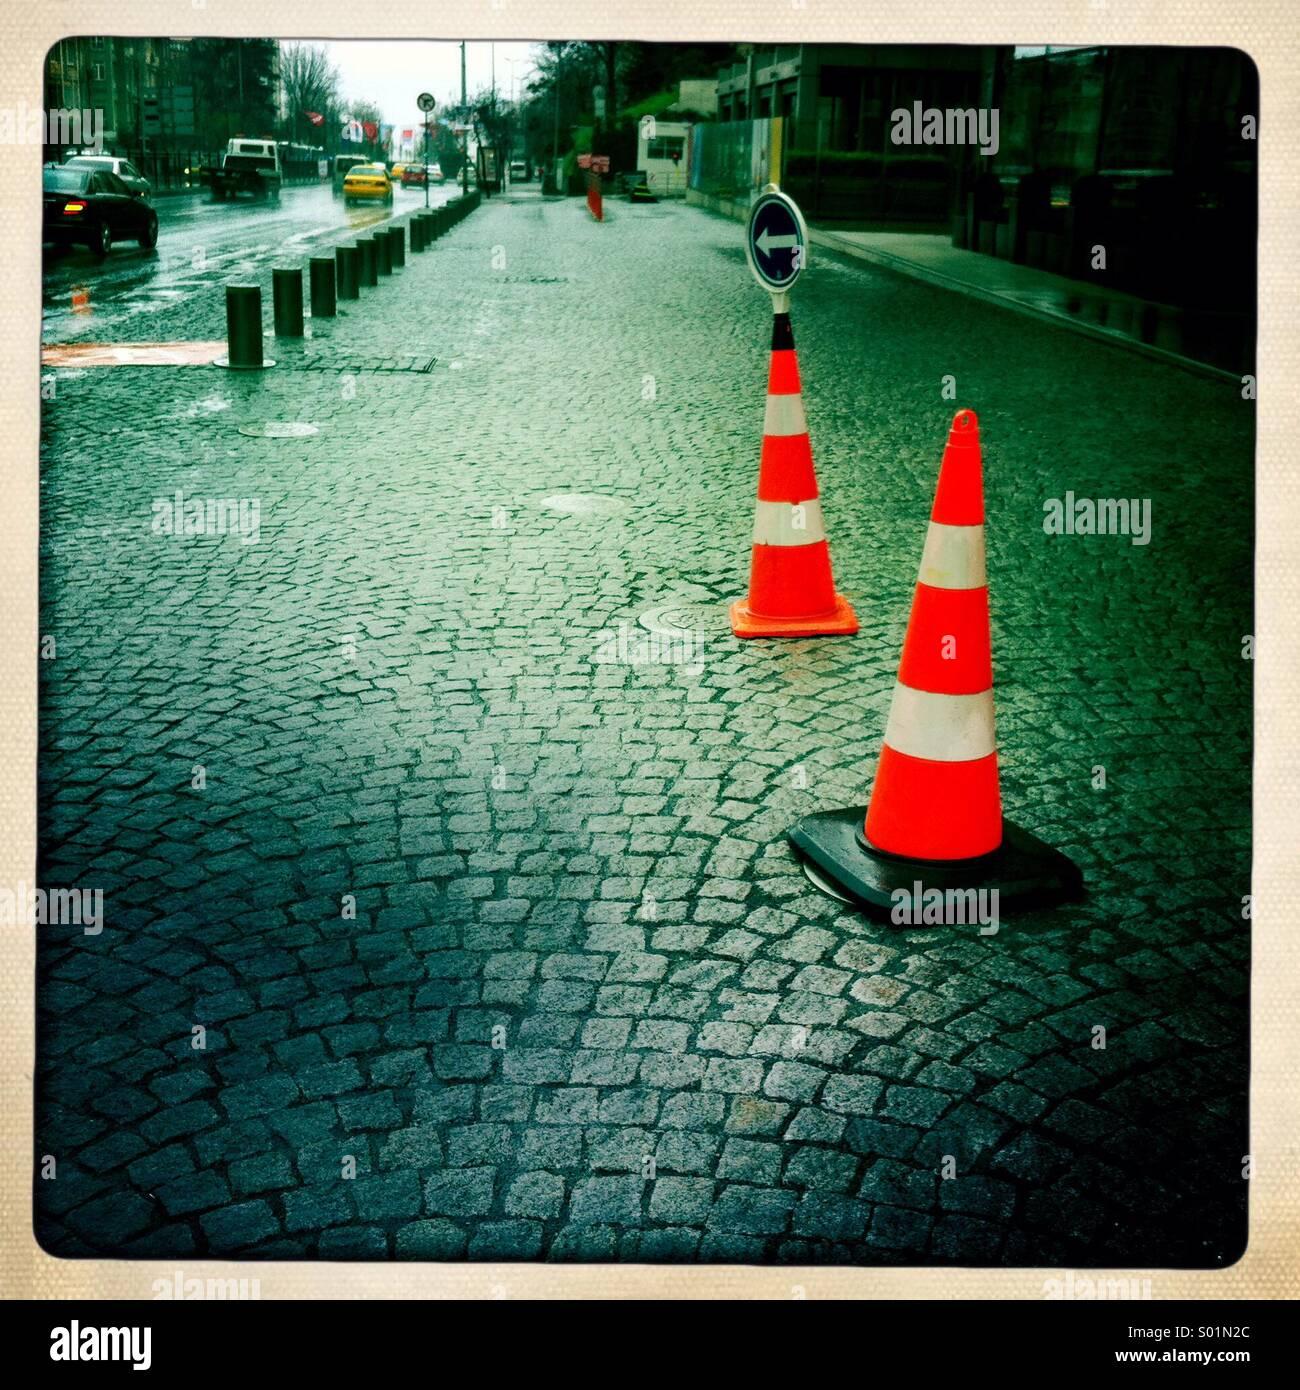 Leitkegel auf der Straße Stockbild